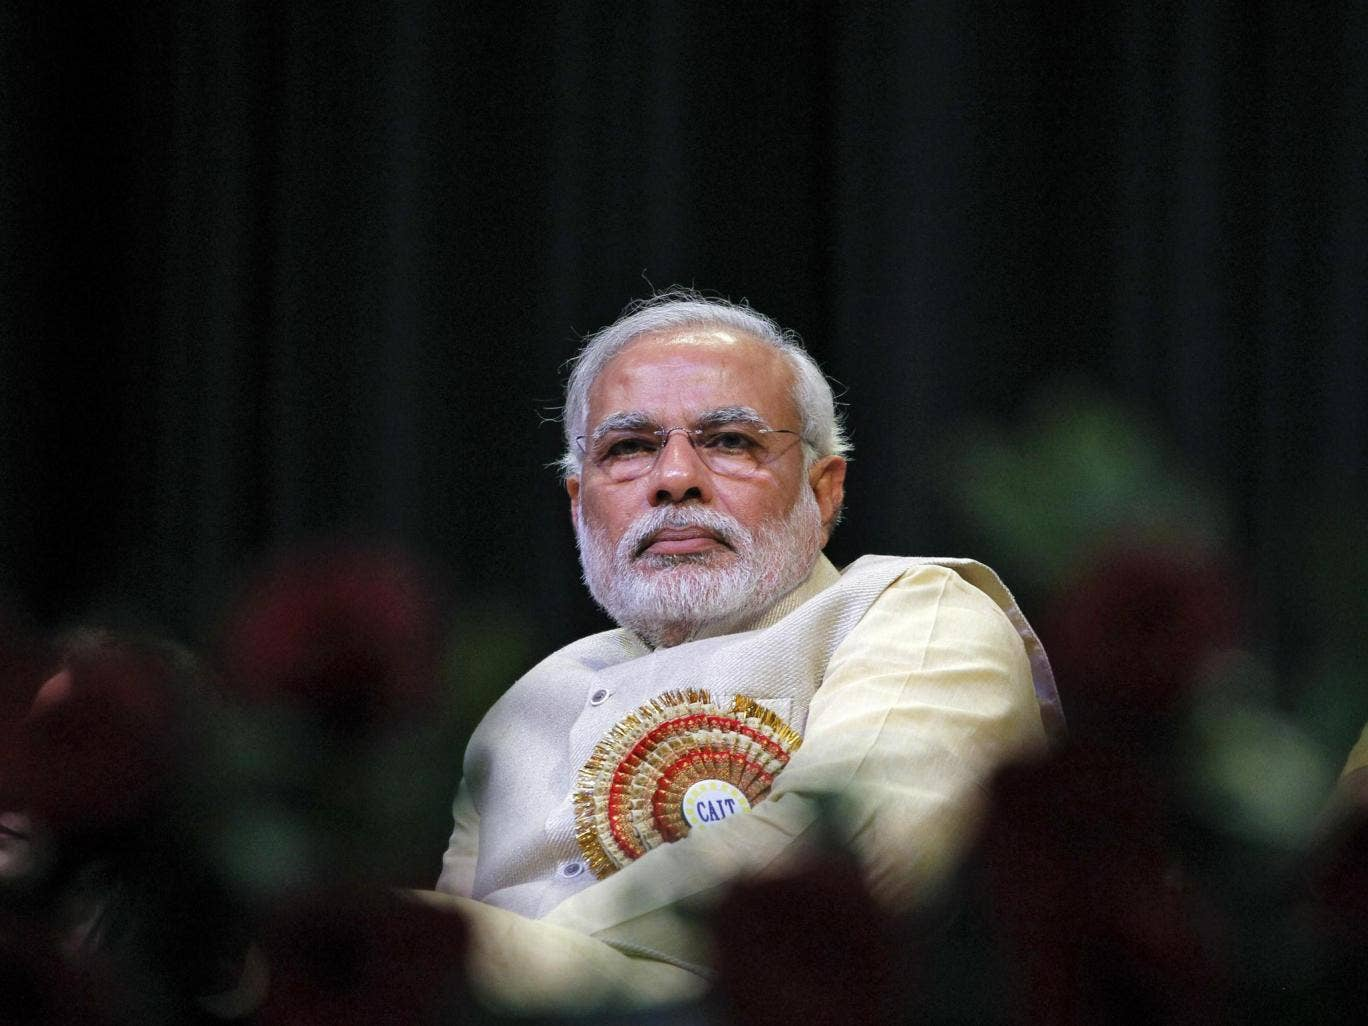 Hindu nationalist Narendra Modi, prime ministerial candidate for India's main opposition Bharatiya Janata Party (BJP)